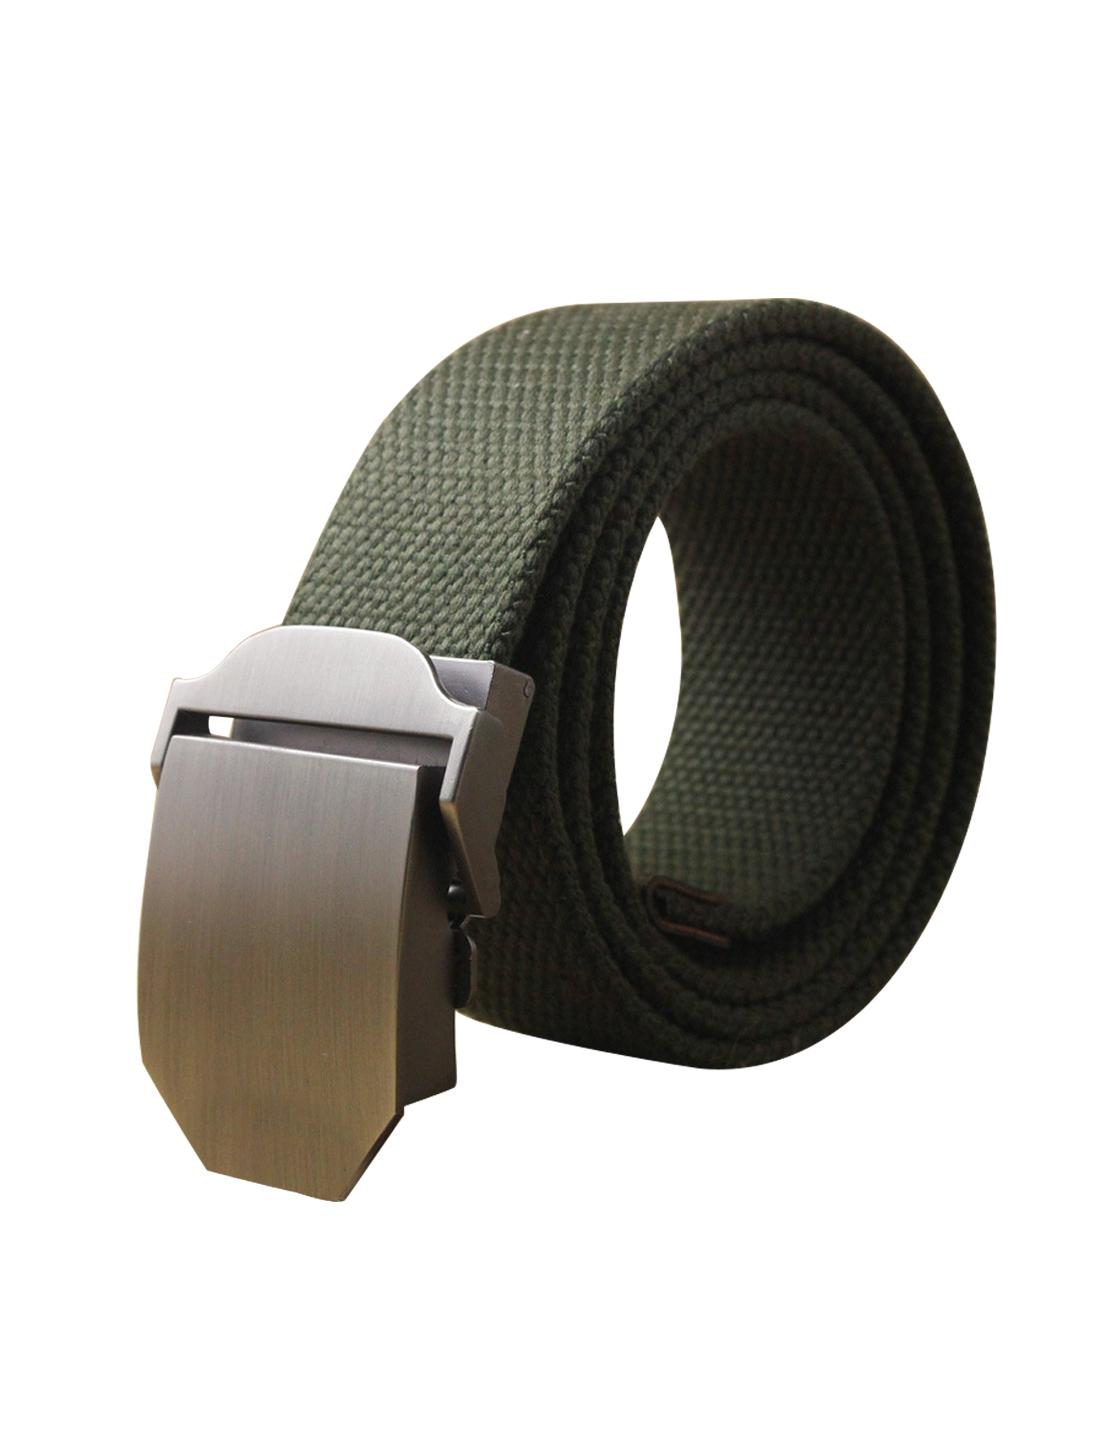 "Men Canvas Automatic Buckle Adjustable Holeless Belt Width 1 1/2"" Dark Green"